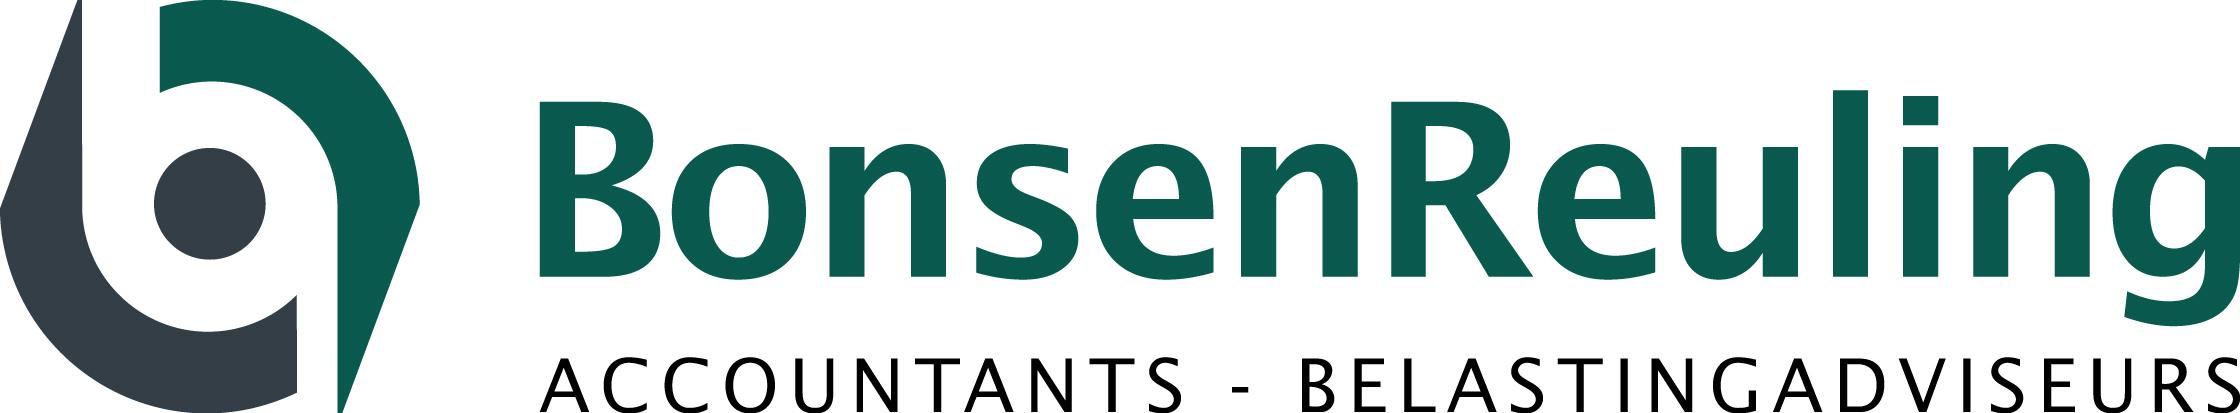 Ga naar BonsenReuling Accountants-Belastingadviseurs